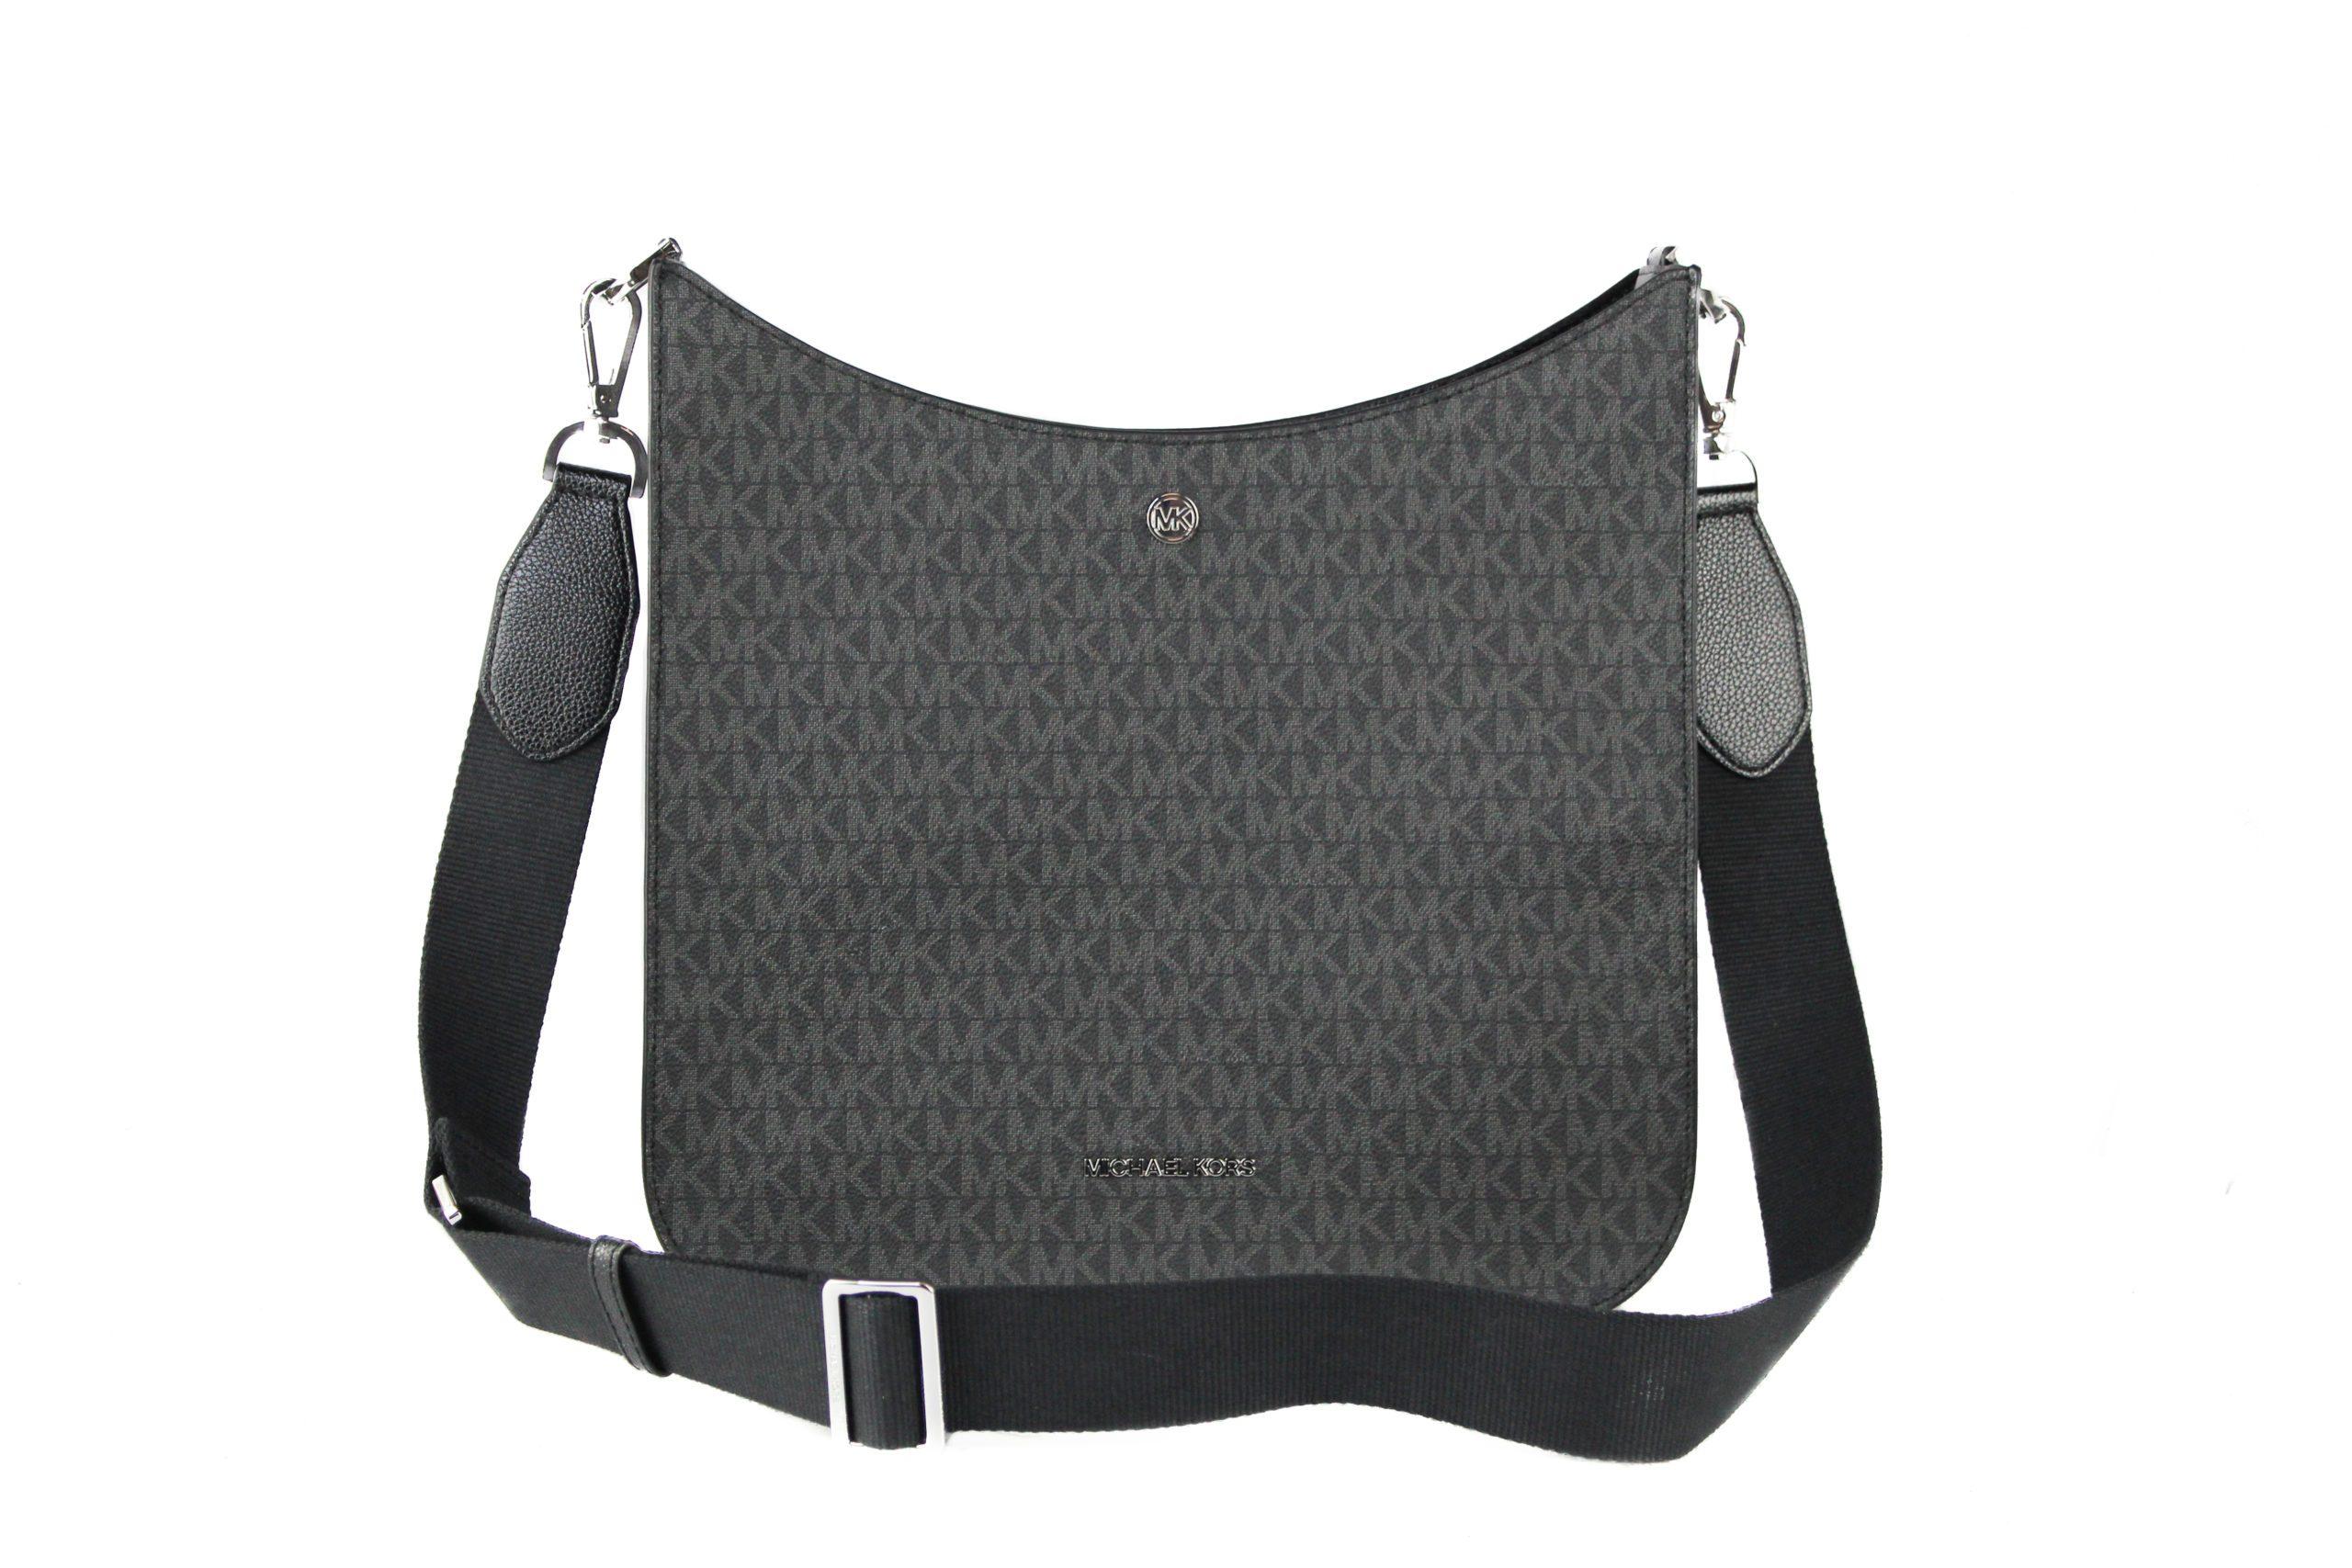 Michael Kors Women's Briley Bag Black 94512